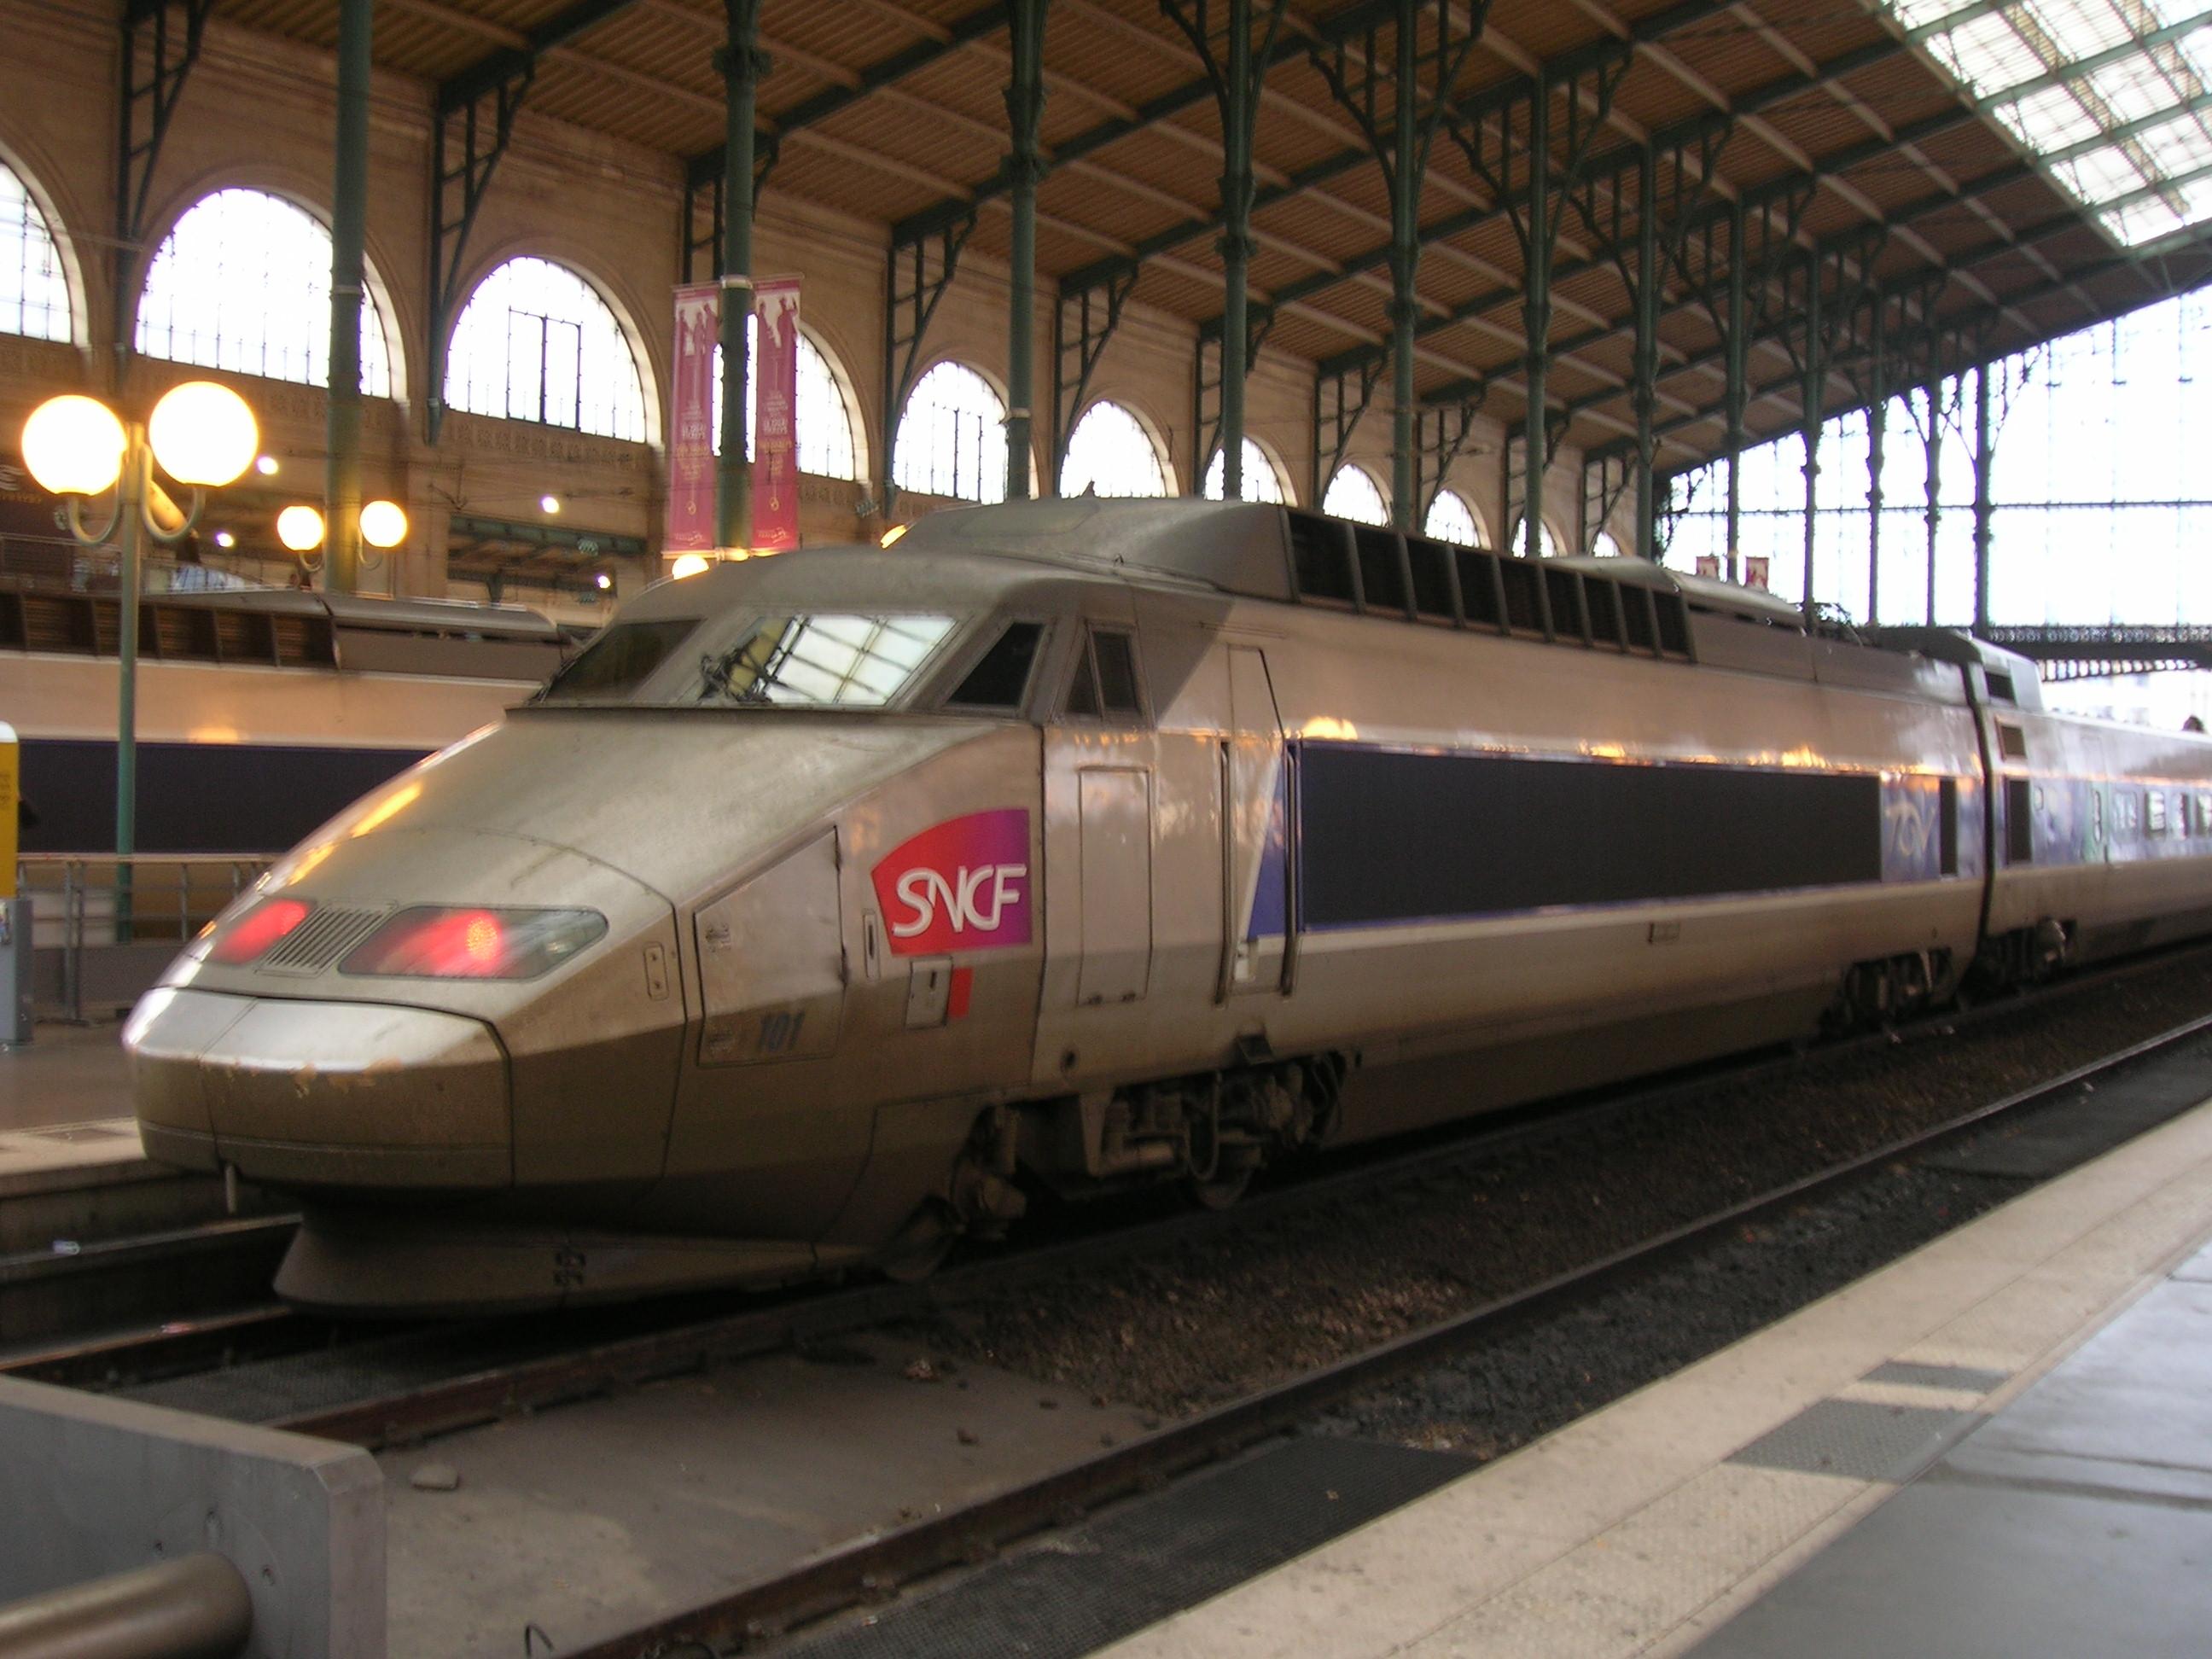 http://upload.wikimedia.org/wikipedia/commons/e/e5/SNCF_TGV_101.JPG